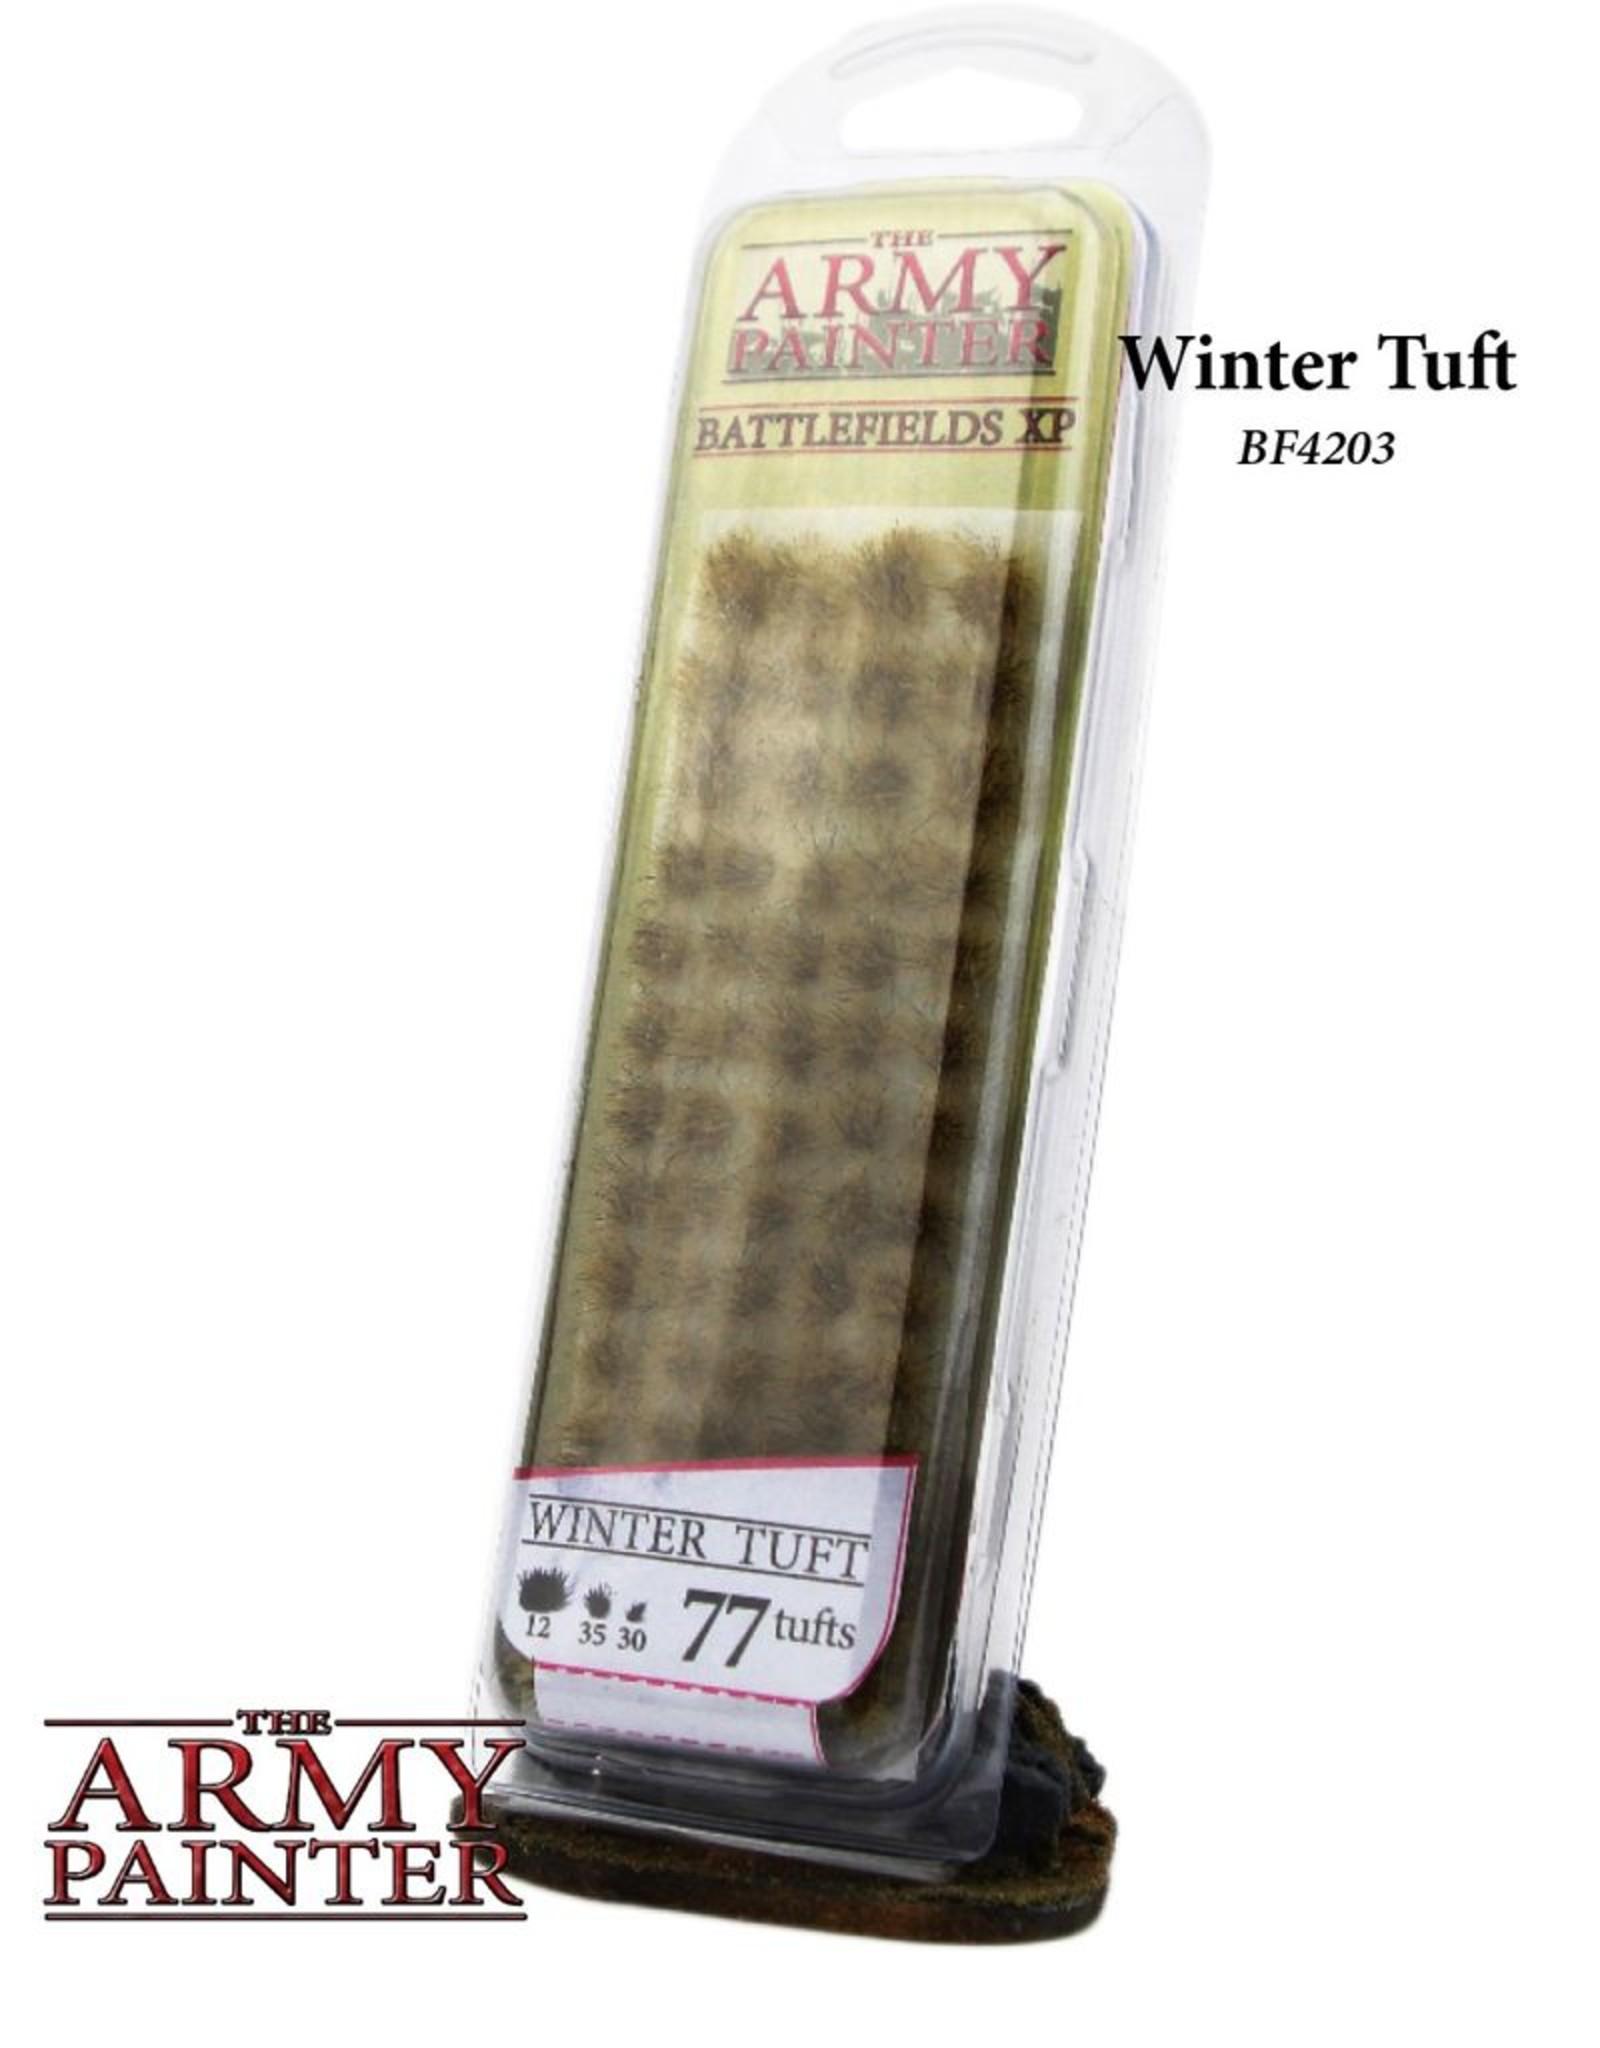 AP - Tabletopzubehör Battlefields XP: Winter Tuft